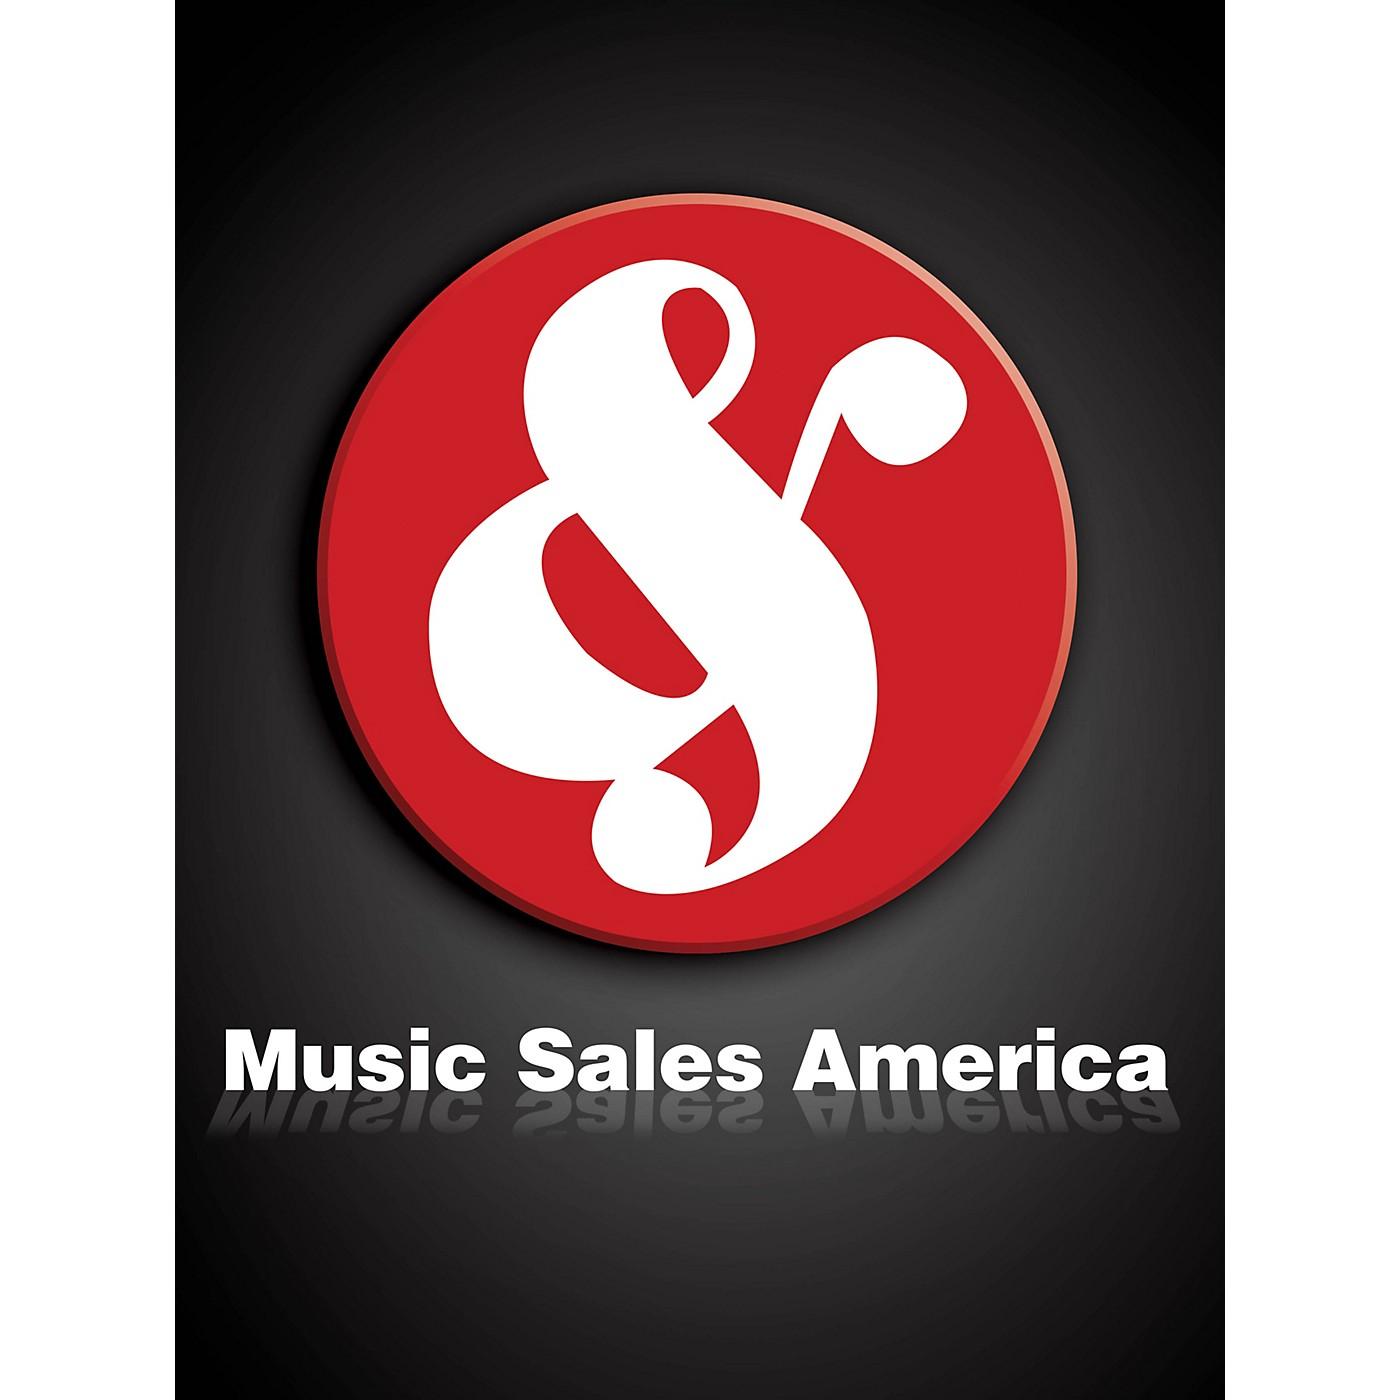 Music Sales Holmboe  Quartetto Medico Op. 70  Flt/ob/clt/pf  Score & Pts Music Sales America Series thumbnail